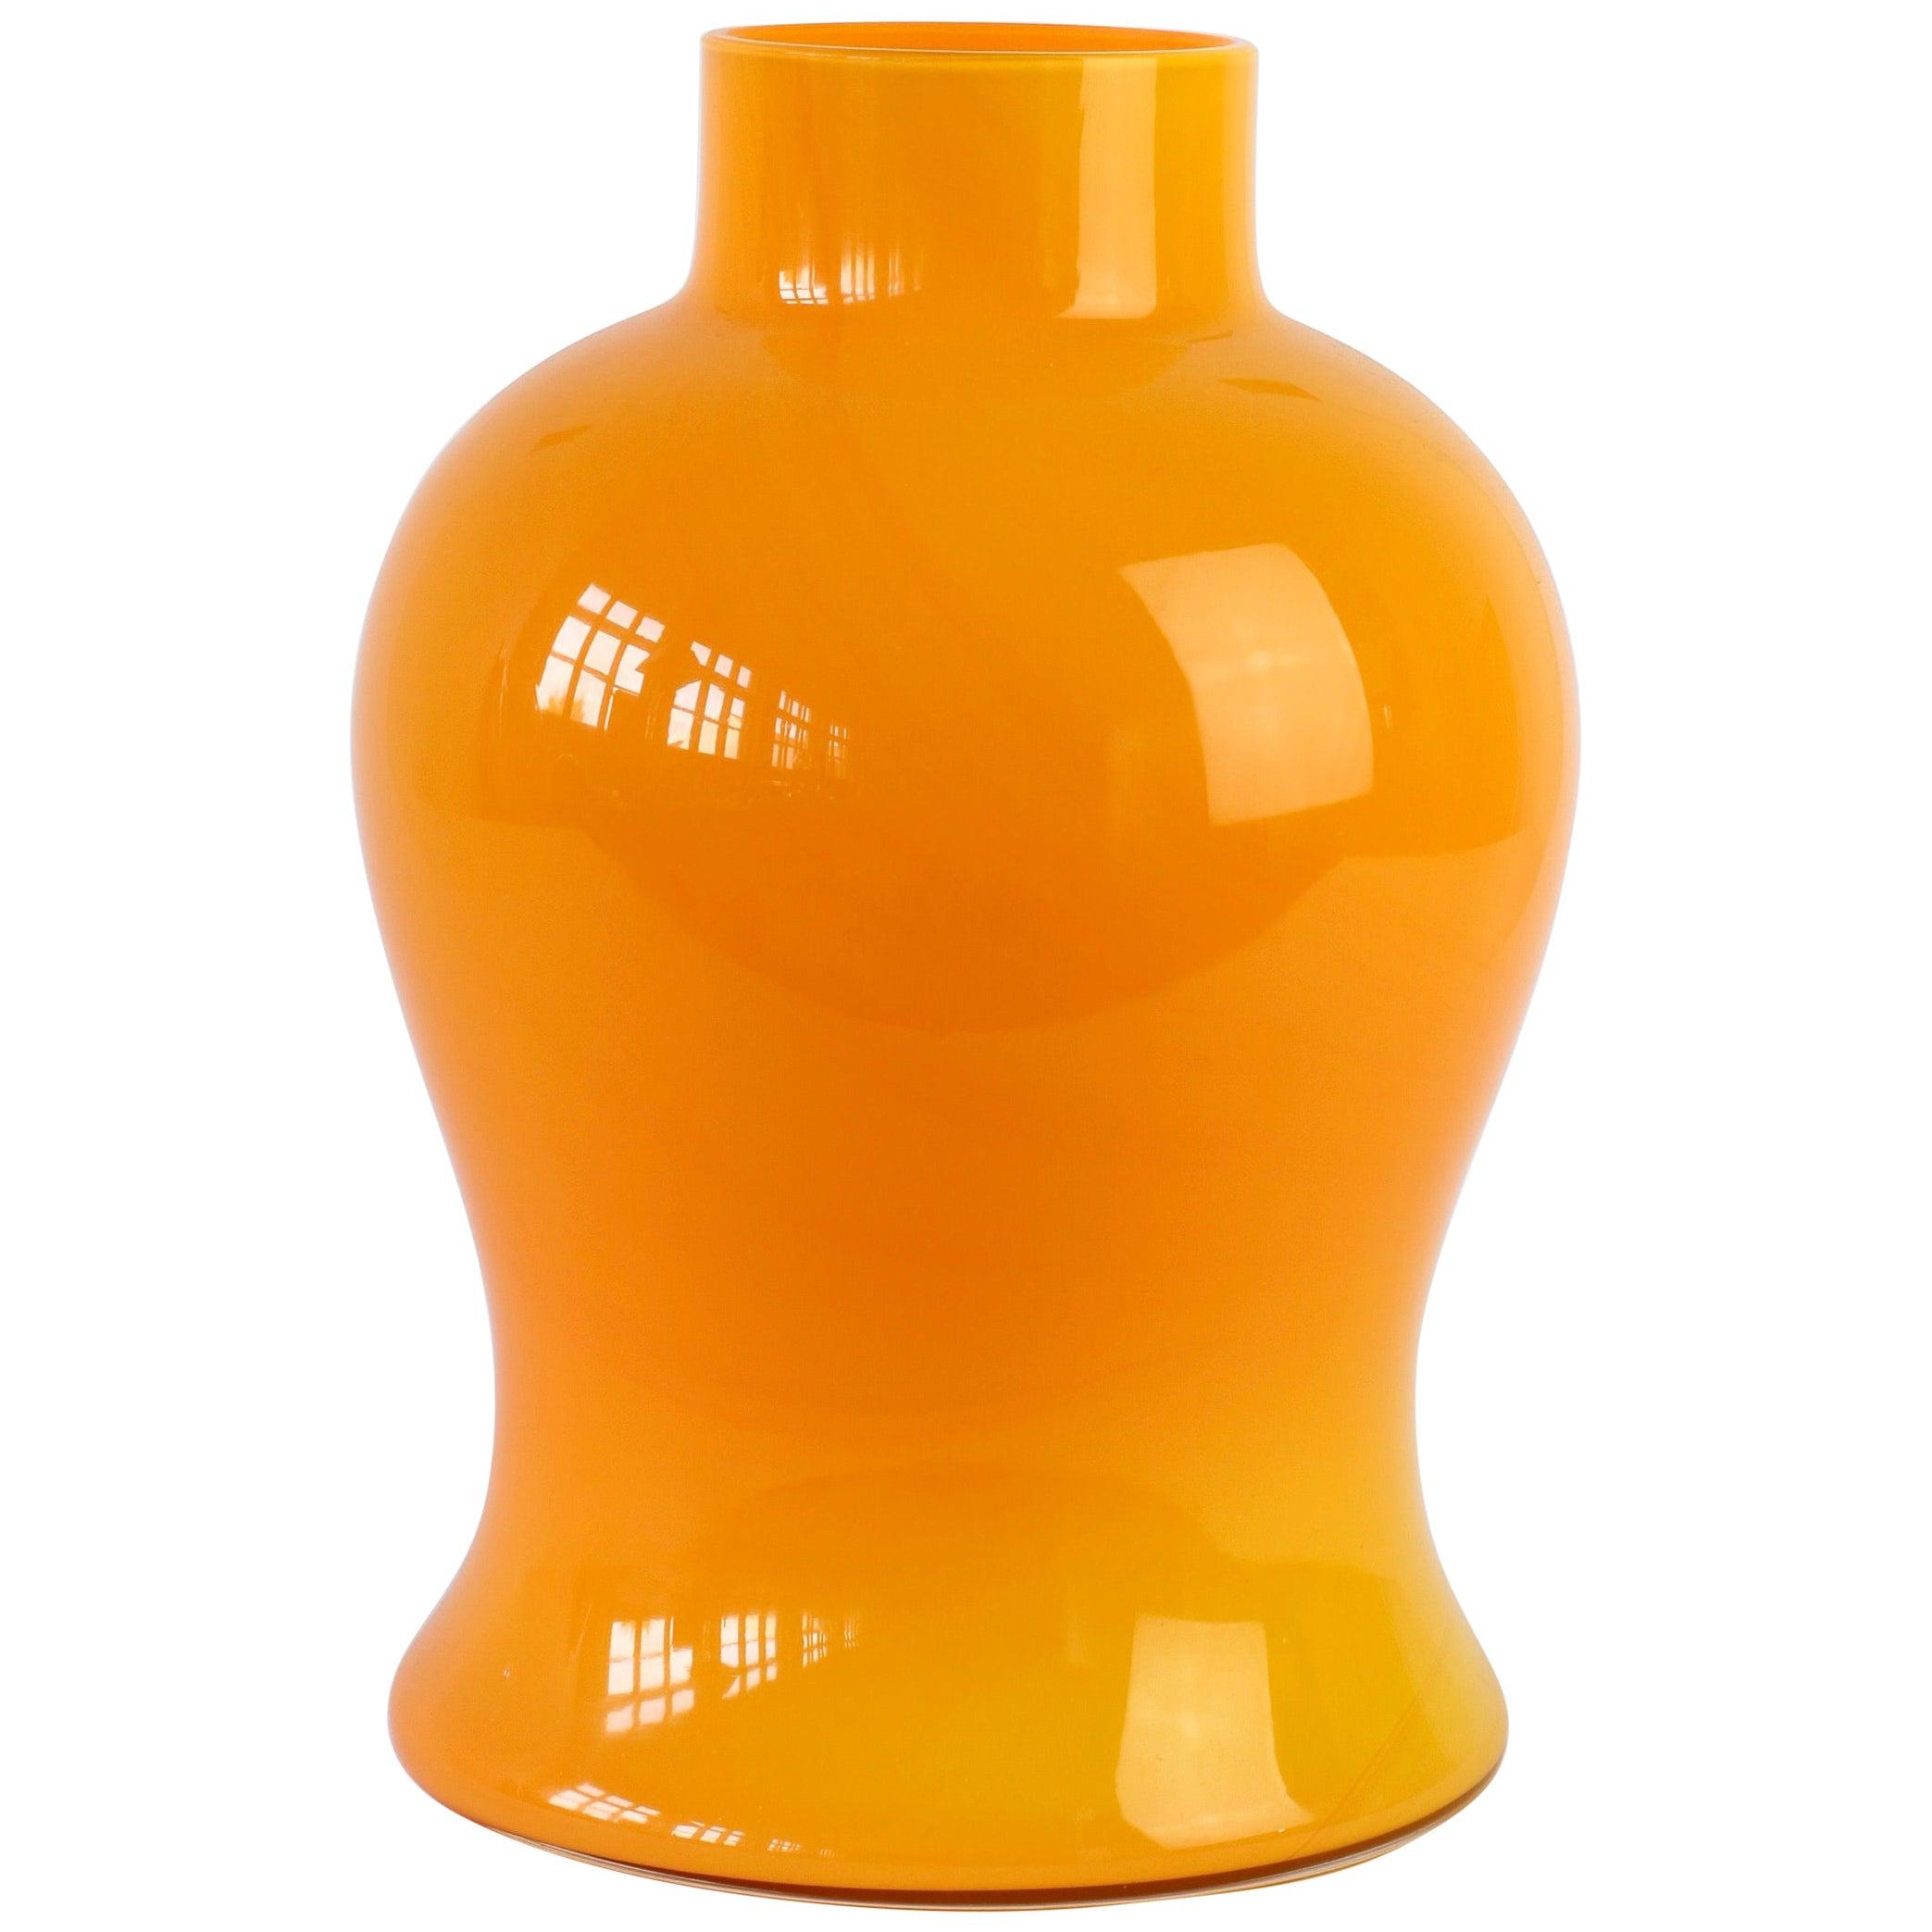 Cenedese Orange Vintage Midcentury Italian Murano Glass Vase